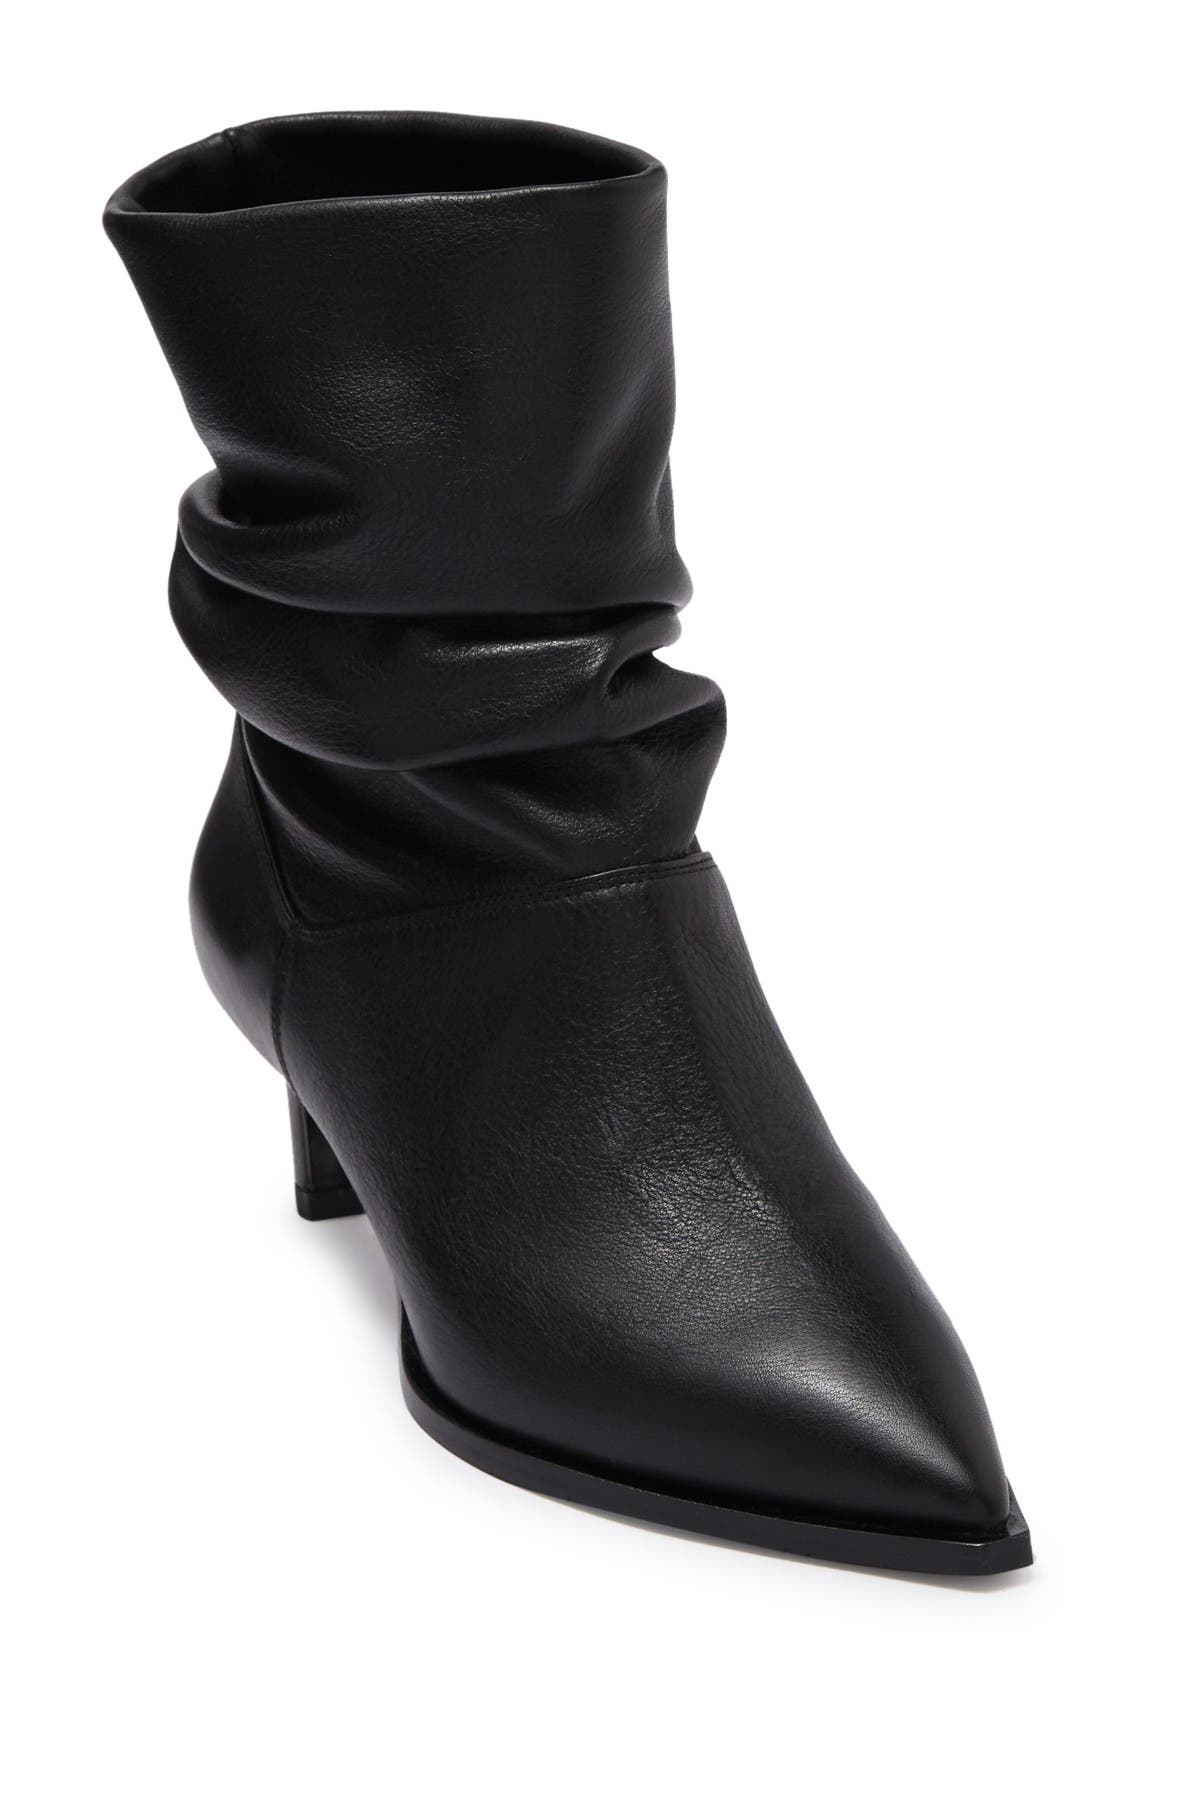 Image of Aquatalia Maddy Tumbled Weatherproof Leather Boots